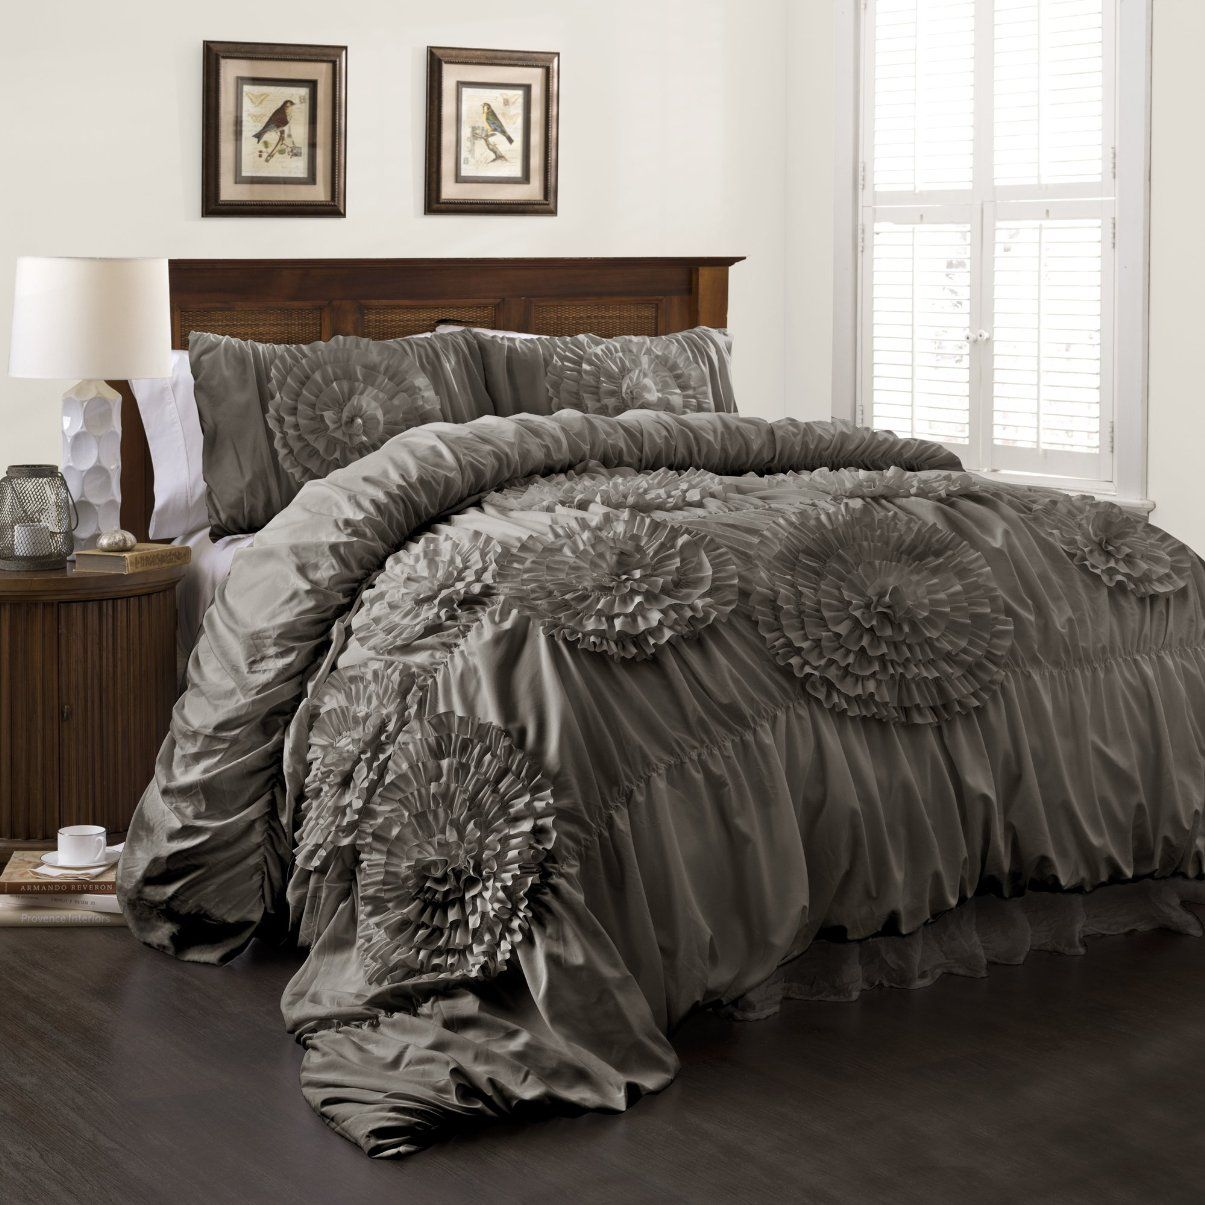 Serena 3 Piece Comforter Set Comforter Sets Bedroom Design Bed